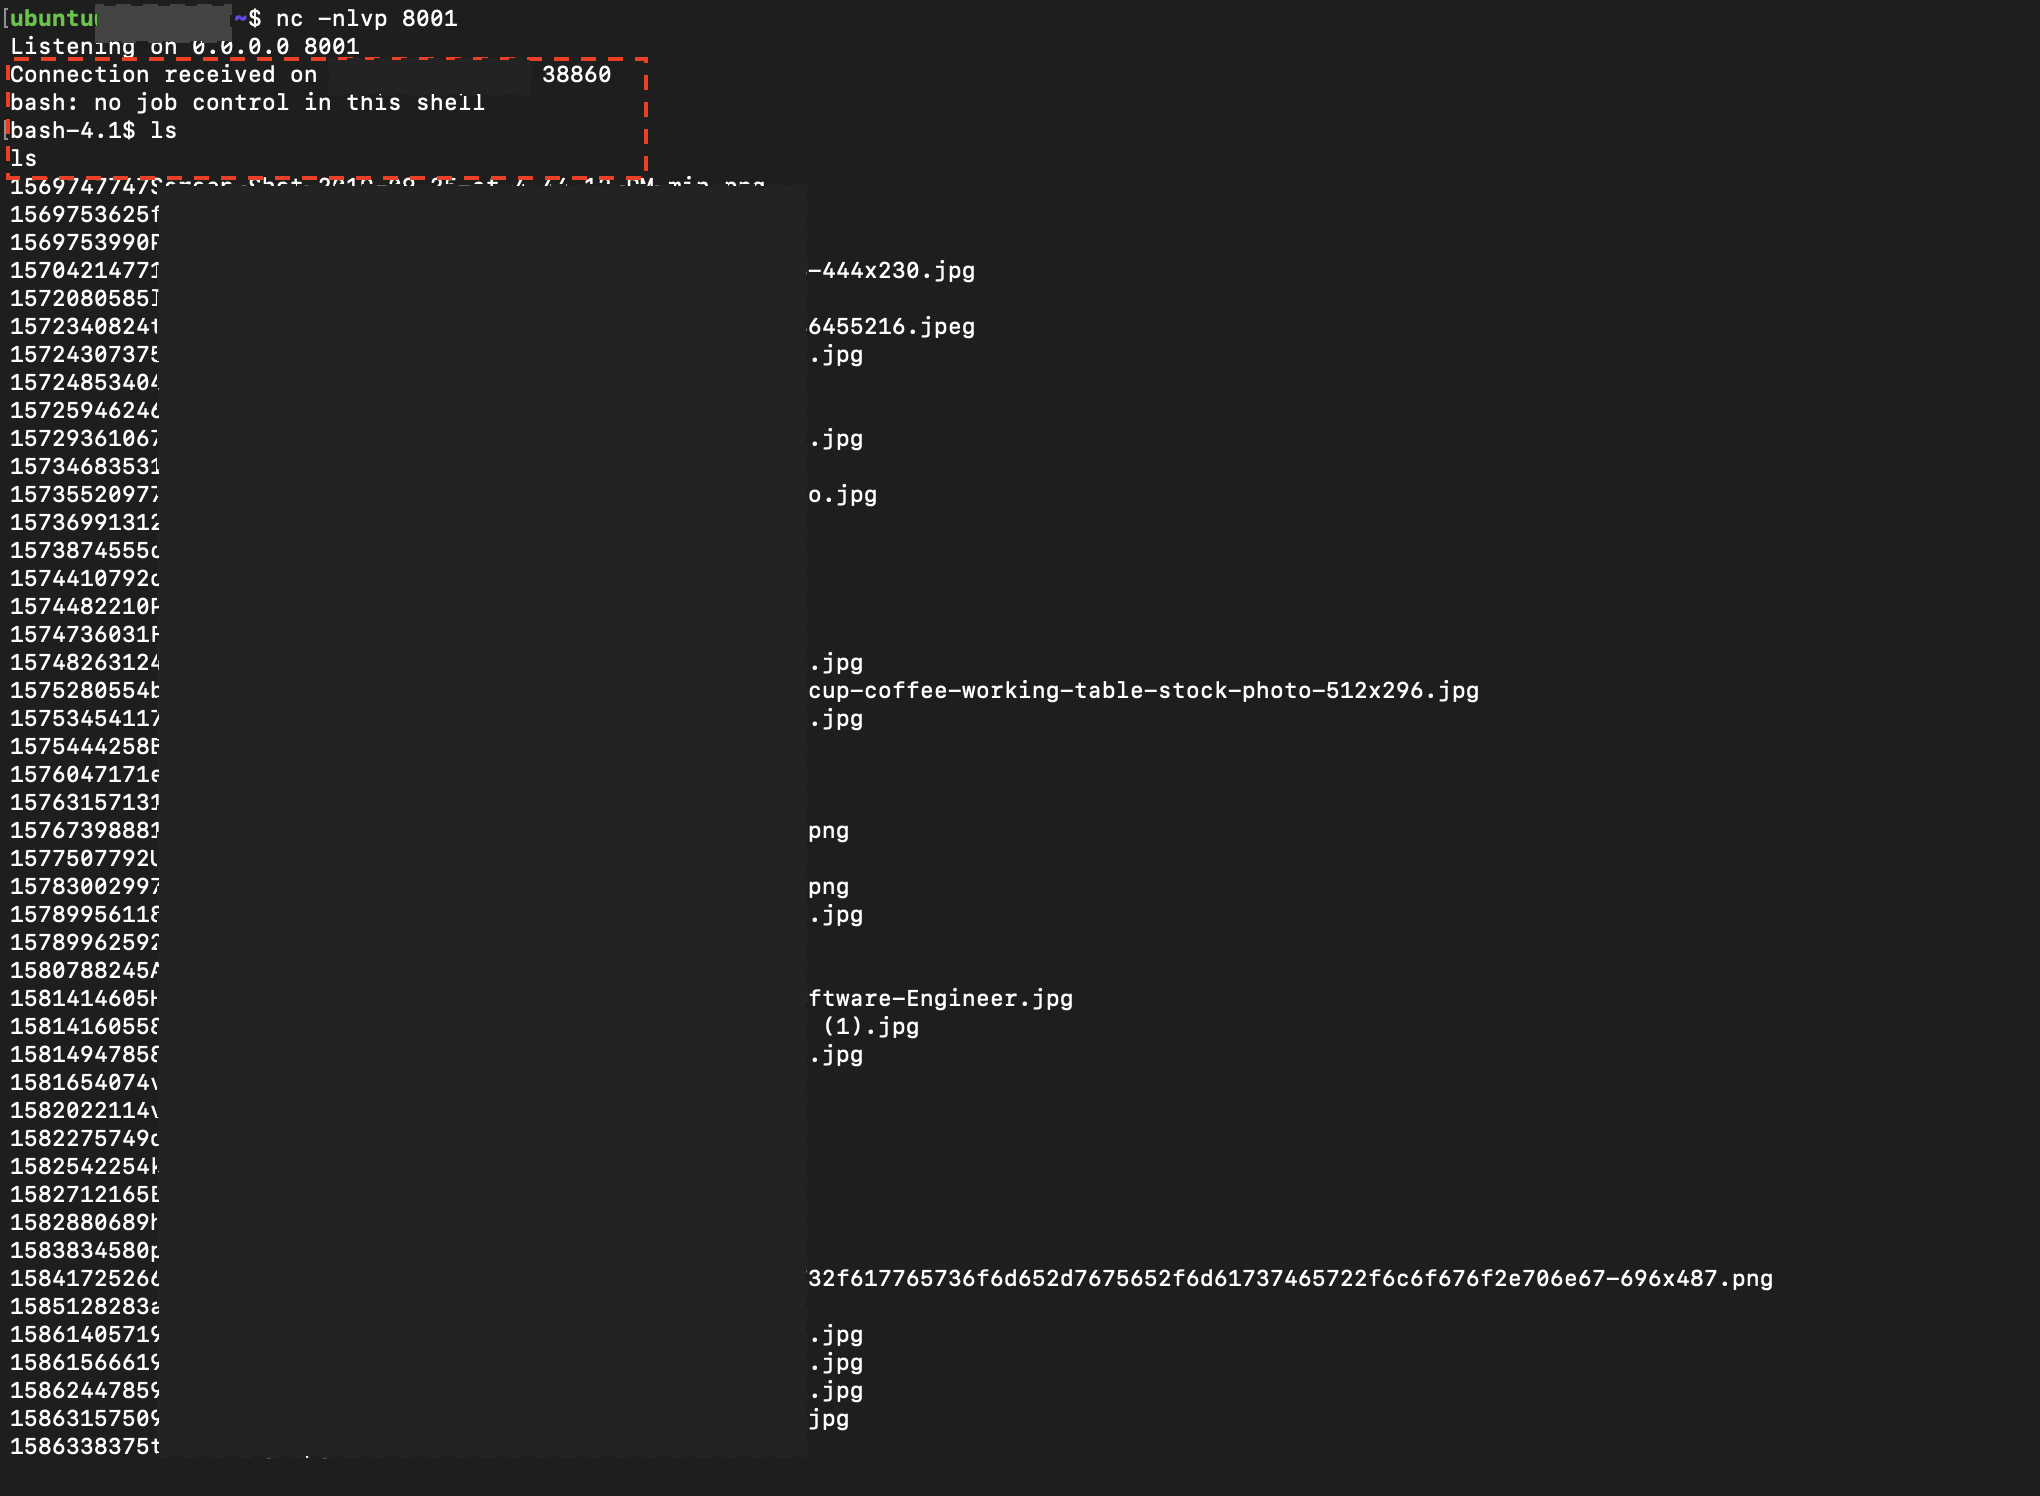 https://manhnv.com/images/posts/hacking/chi-mot-buoi-chieu-toi-da-chiem-quyen-dieu-khien-server-cua-8-website-nhu-the-nao/Screen_Shot_2021-01-14_at_14.52.43.png